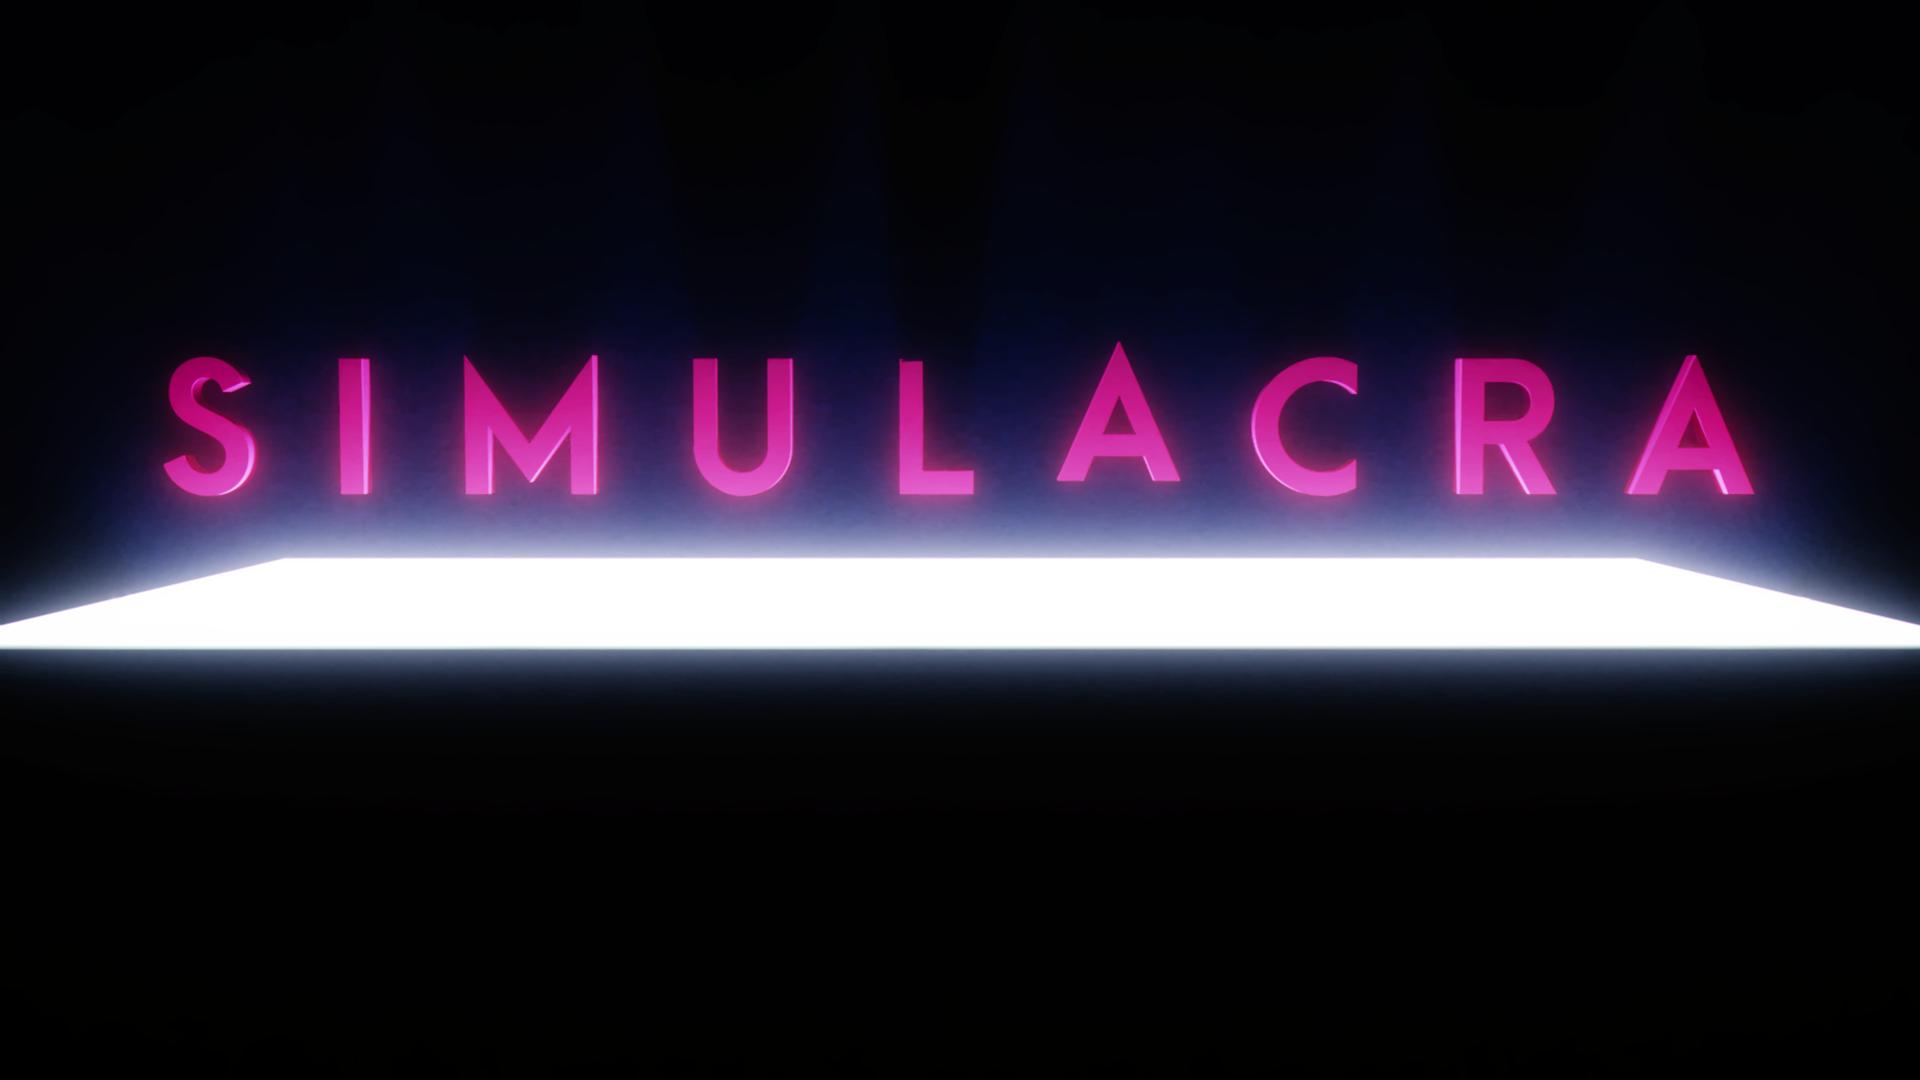 SIMULACRA Free Download